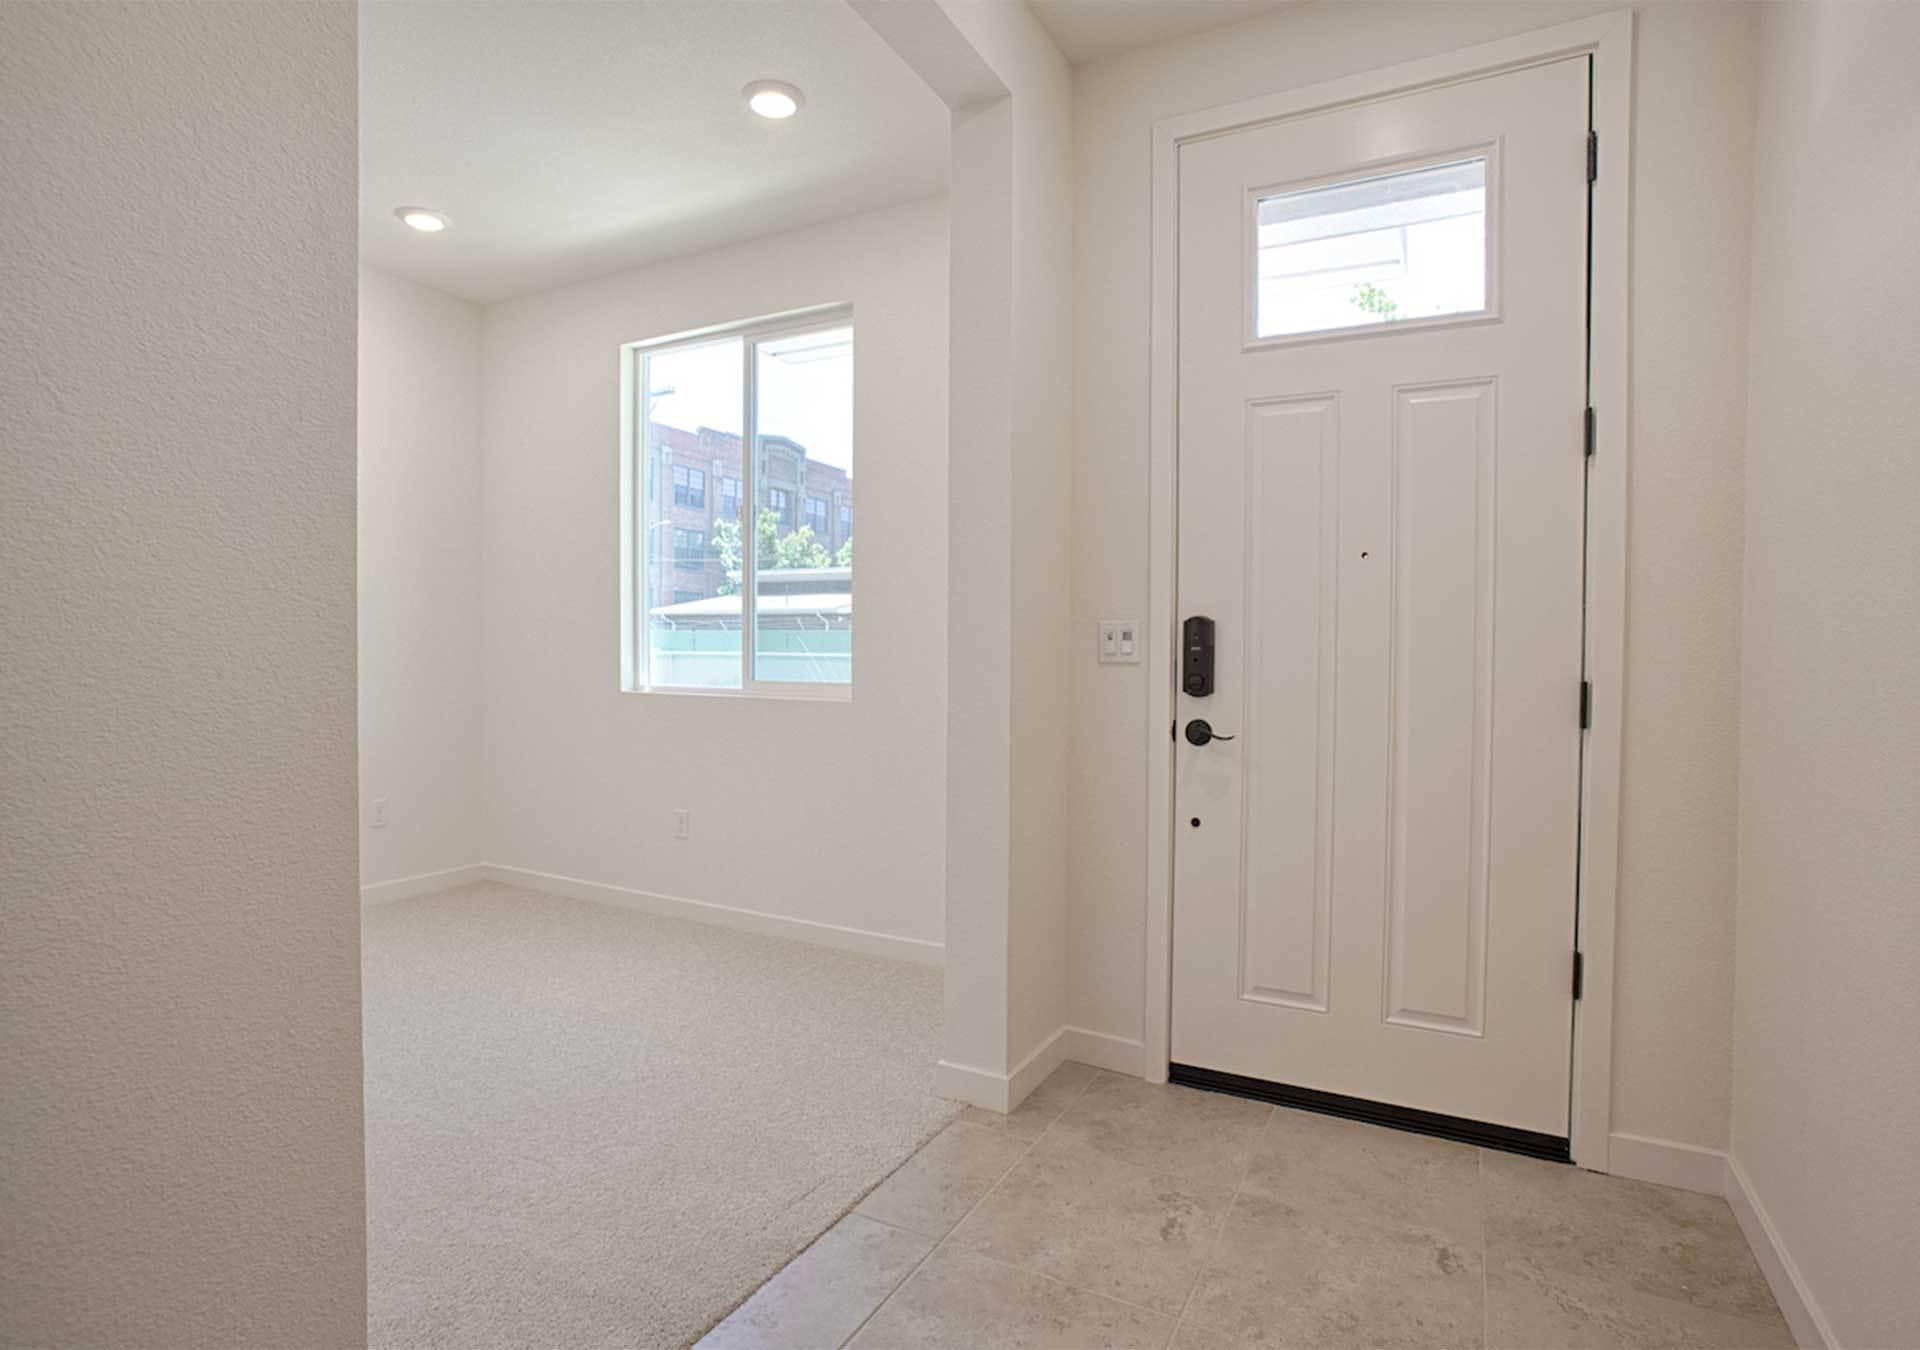 Homesite 108 - Entry